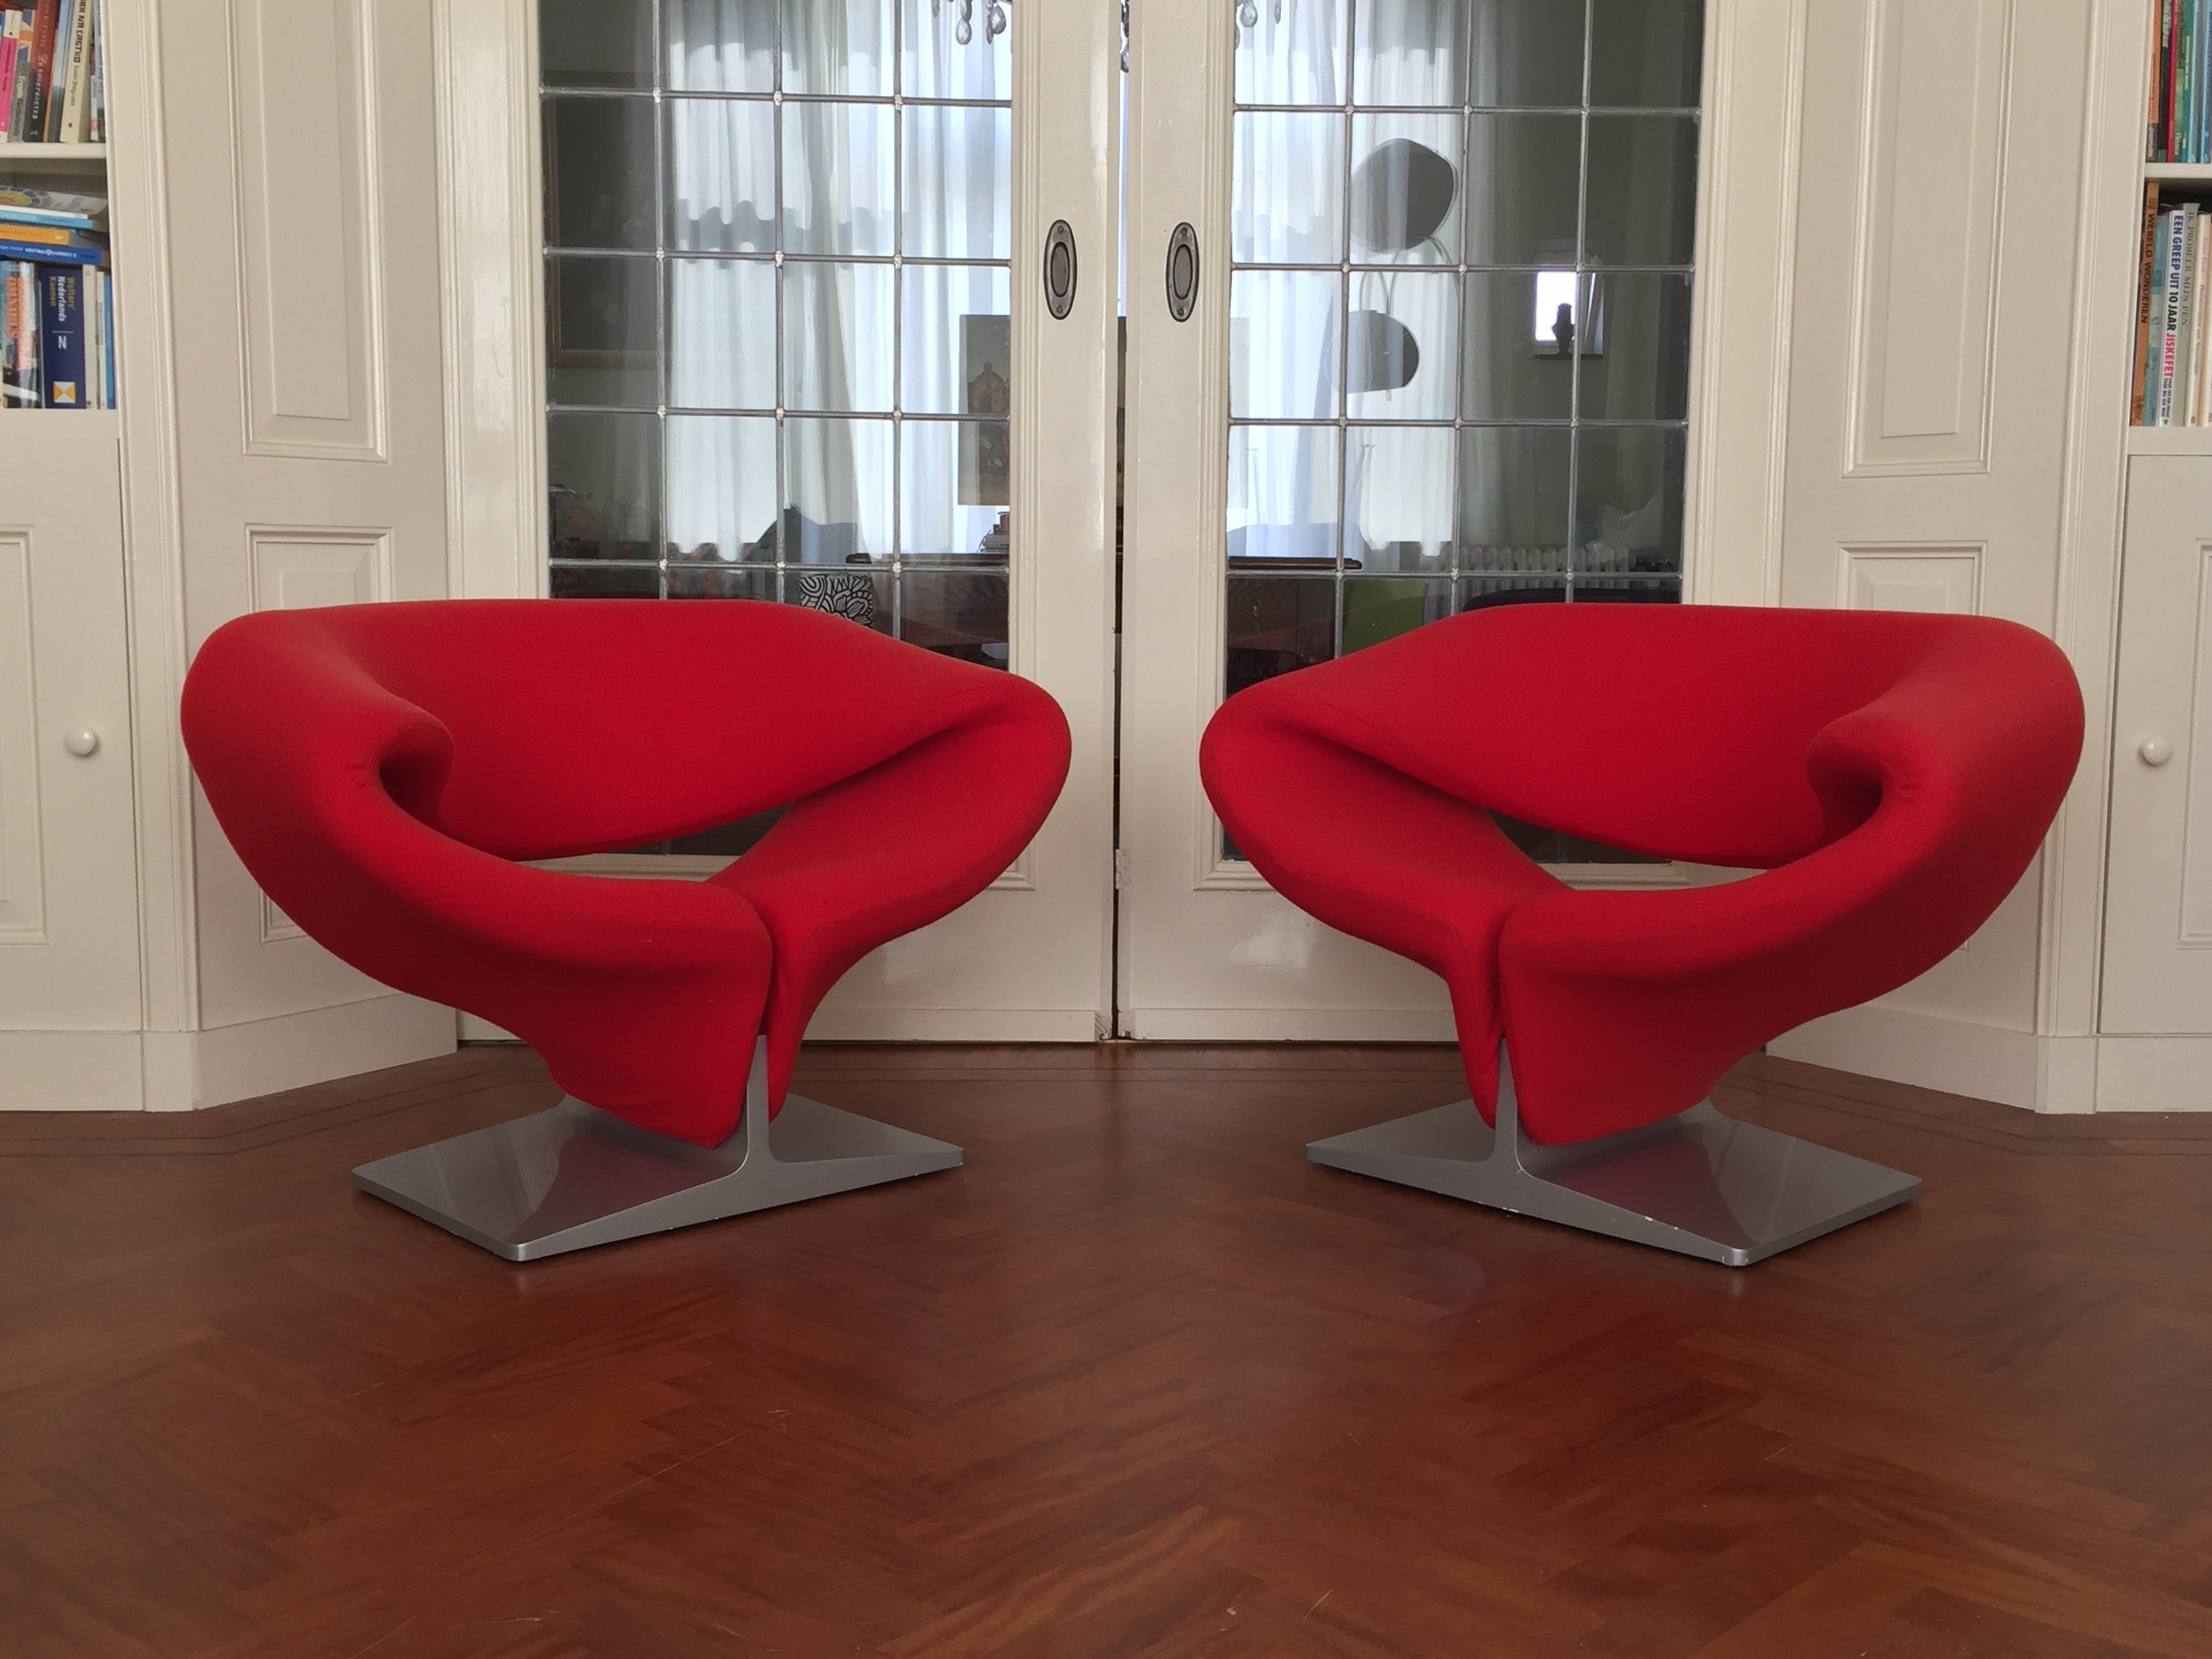 Pierre paulin for artifort vintage butterfly chair f catawiki